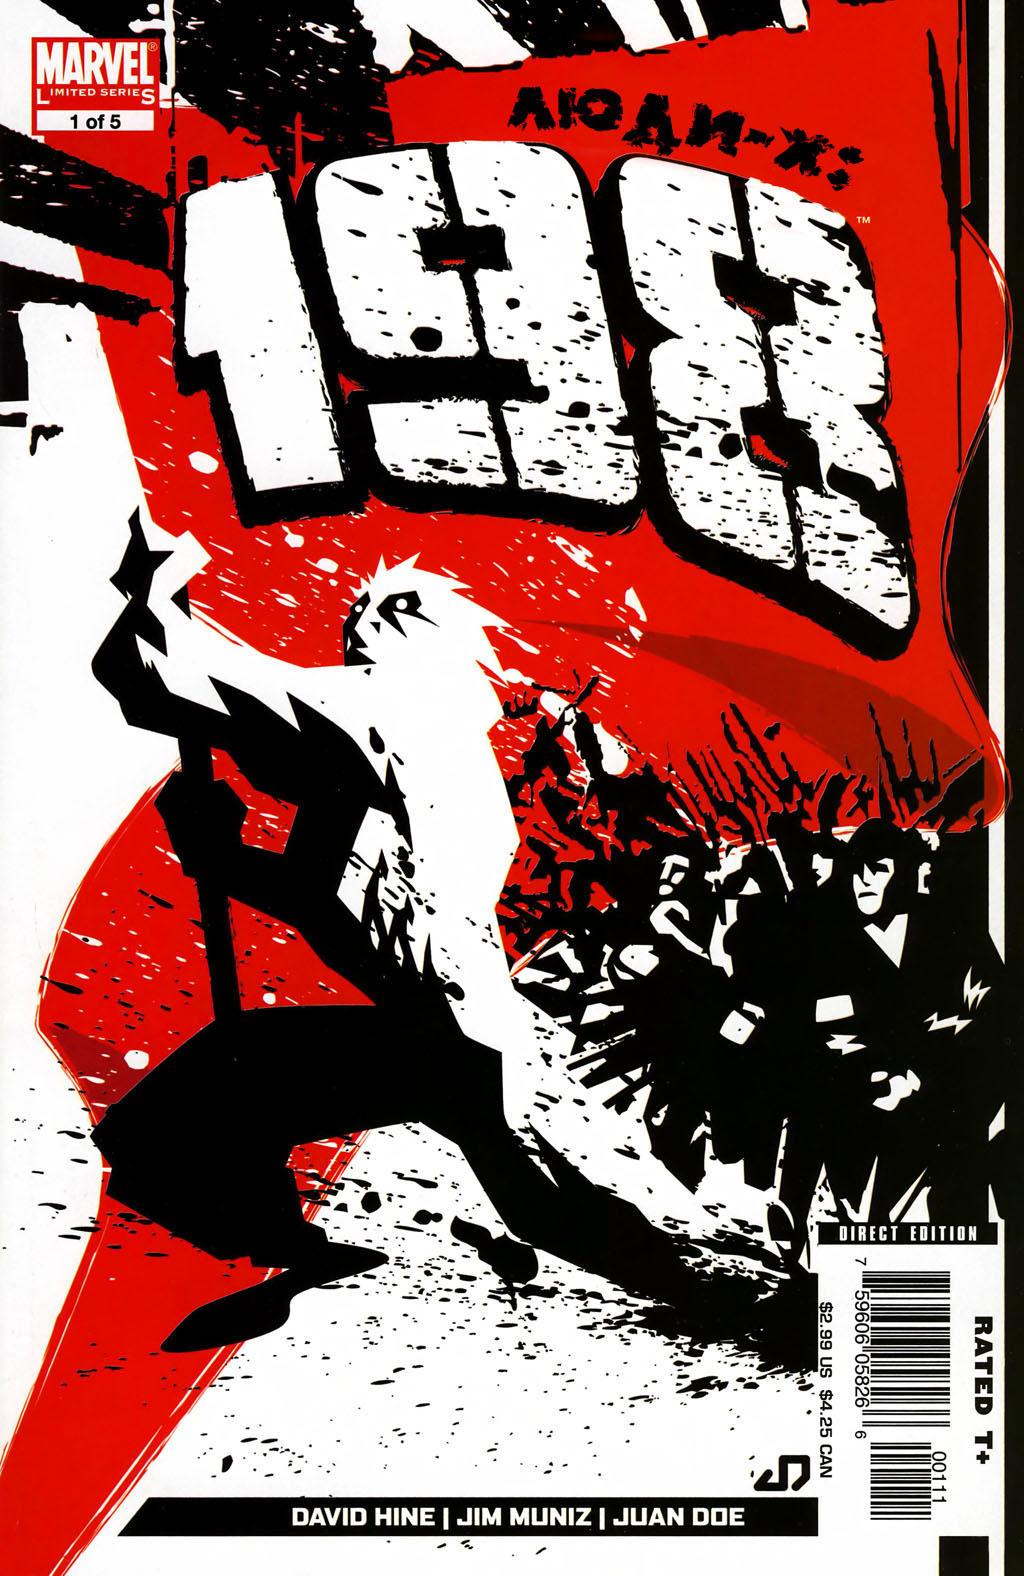 Комикс Люди-Икс 198